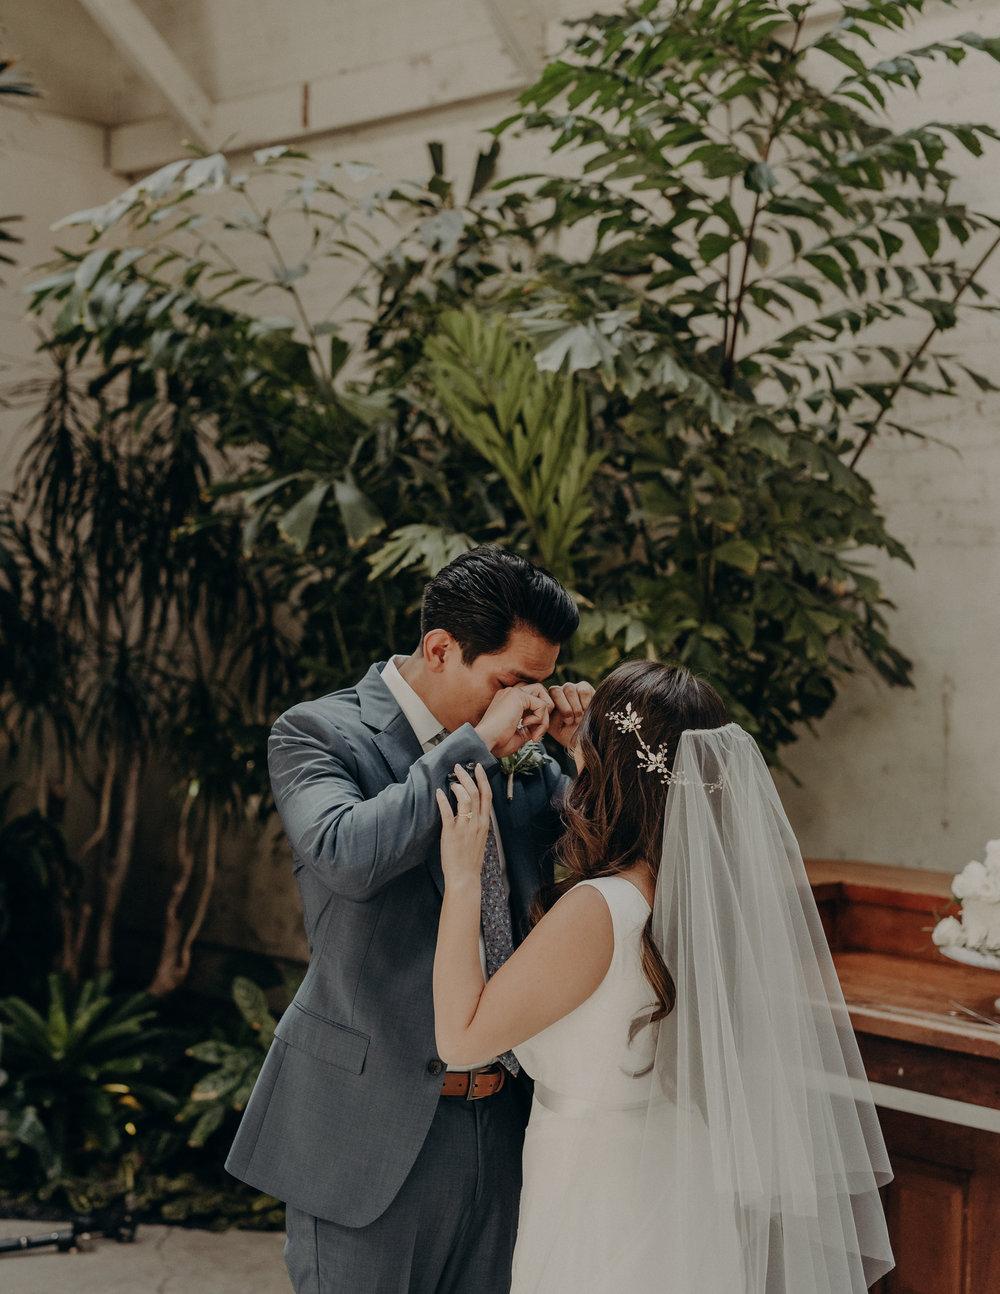 IsaiahAndTaylor.com - DTLA Millwick Wedding -034.jpg